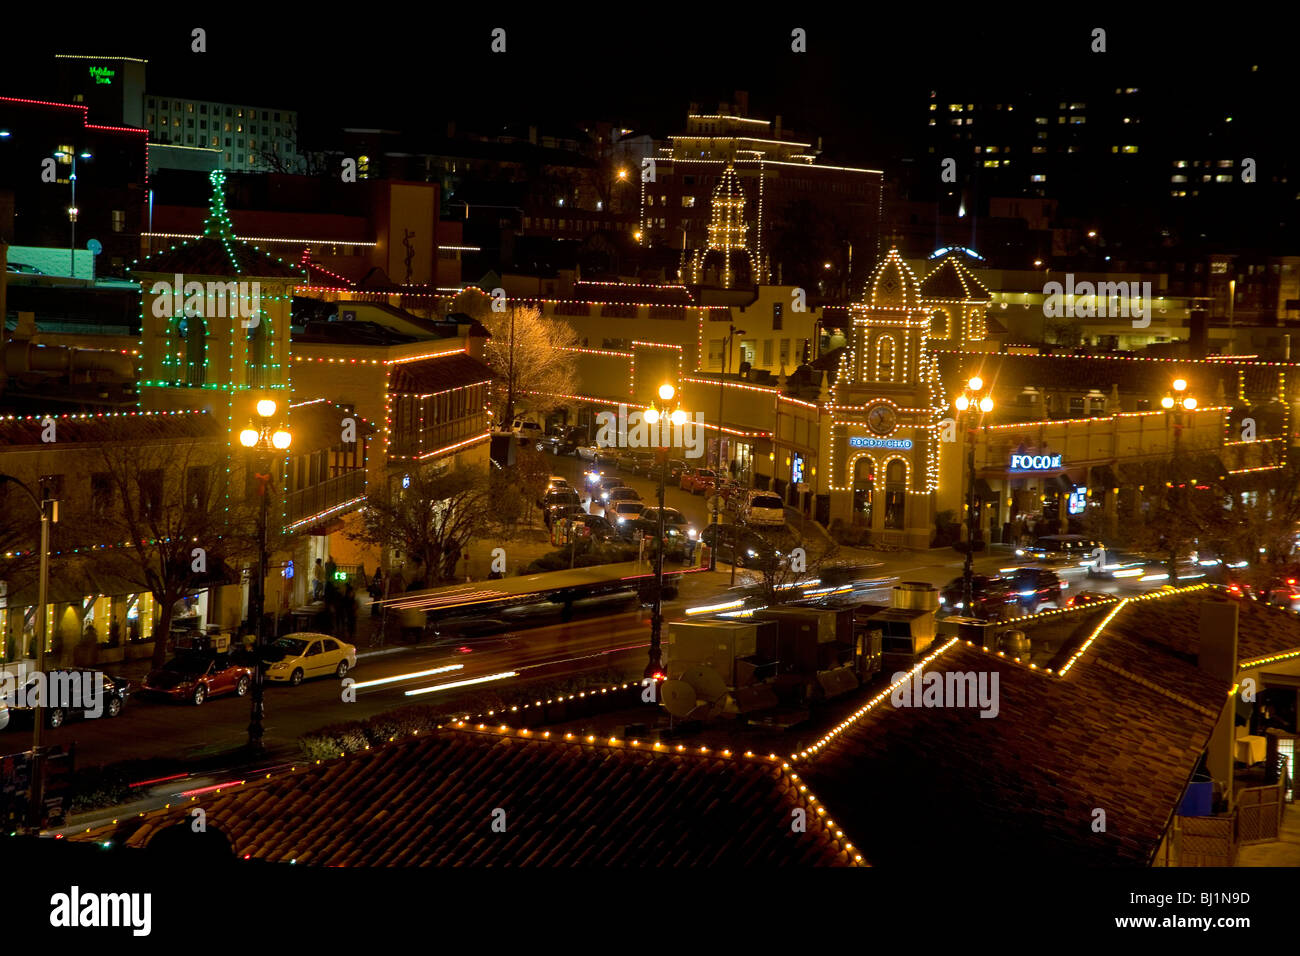 Country Club Plaza Christmas Lights in Kansas City, Missouri - Stock Image